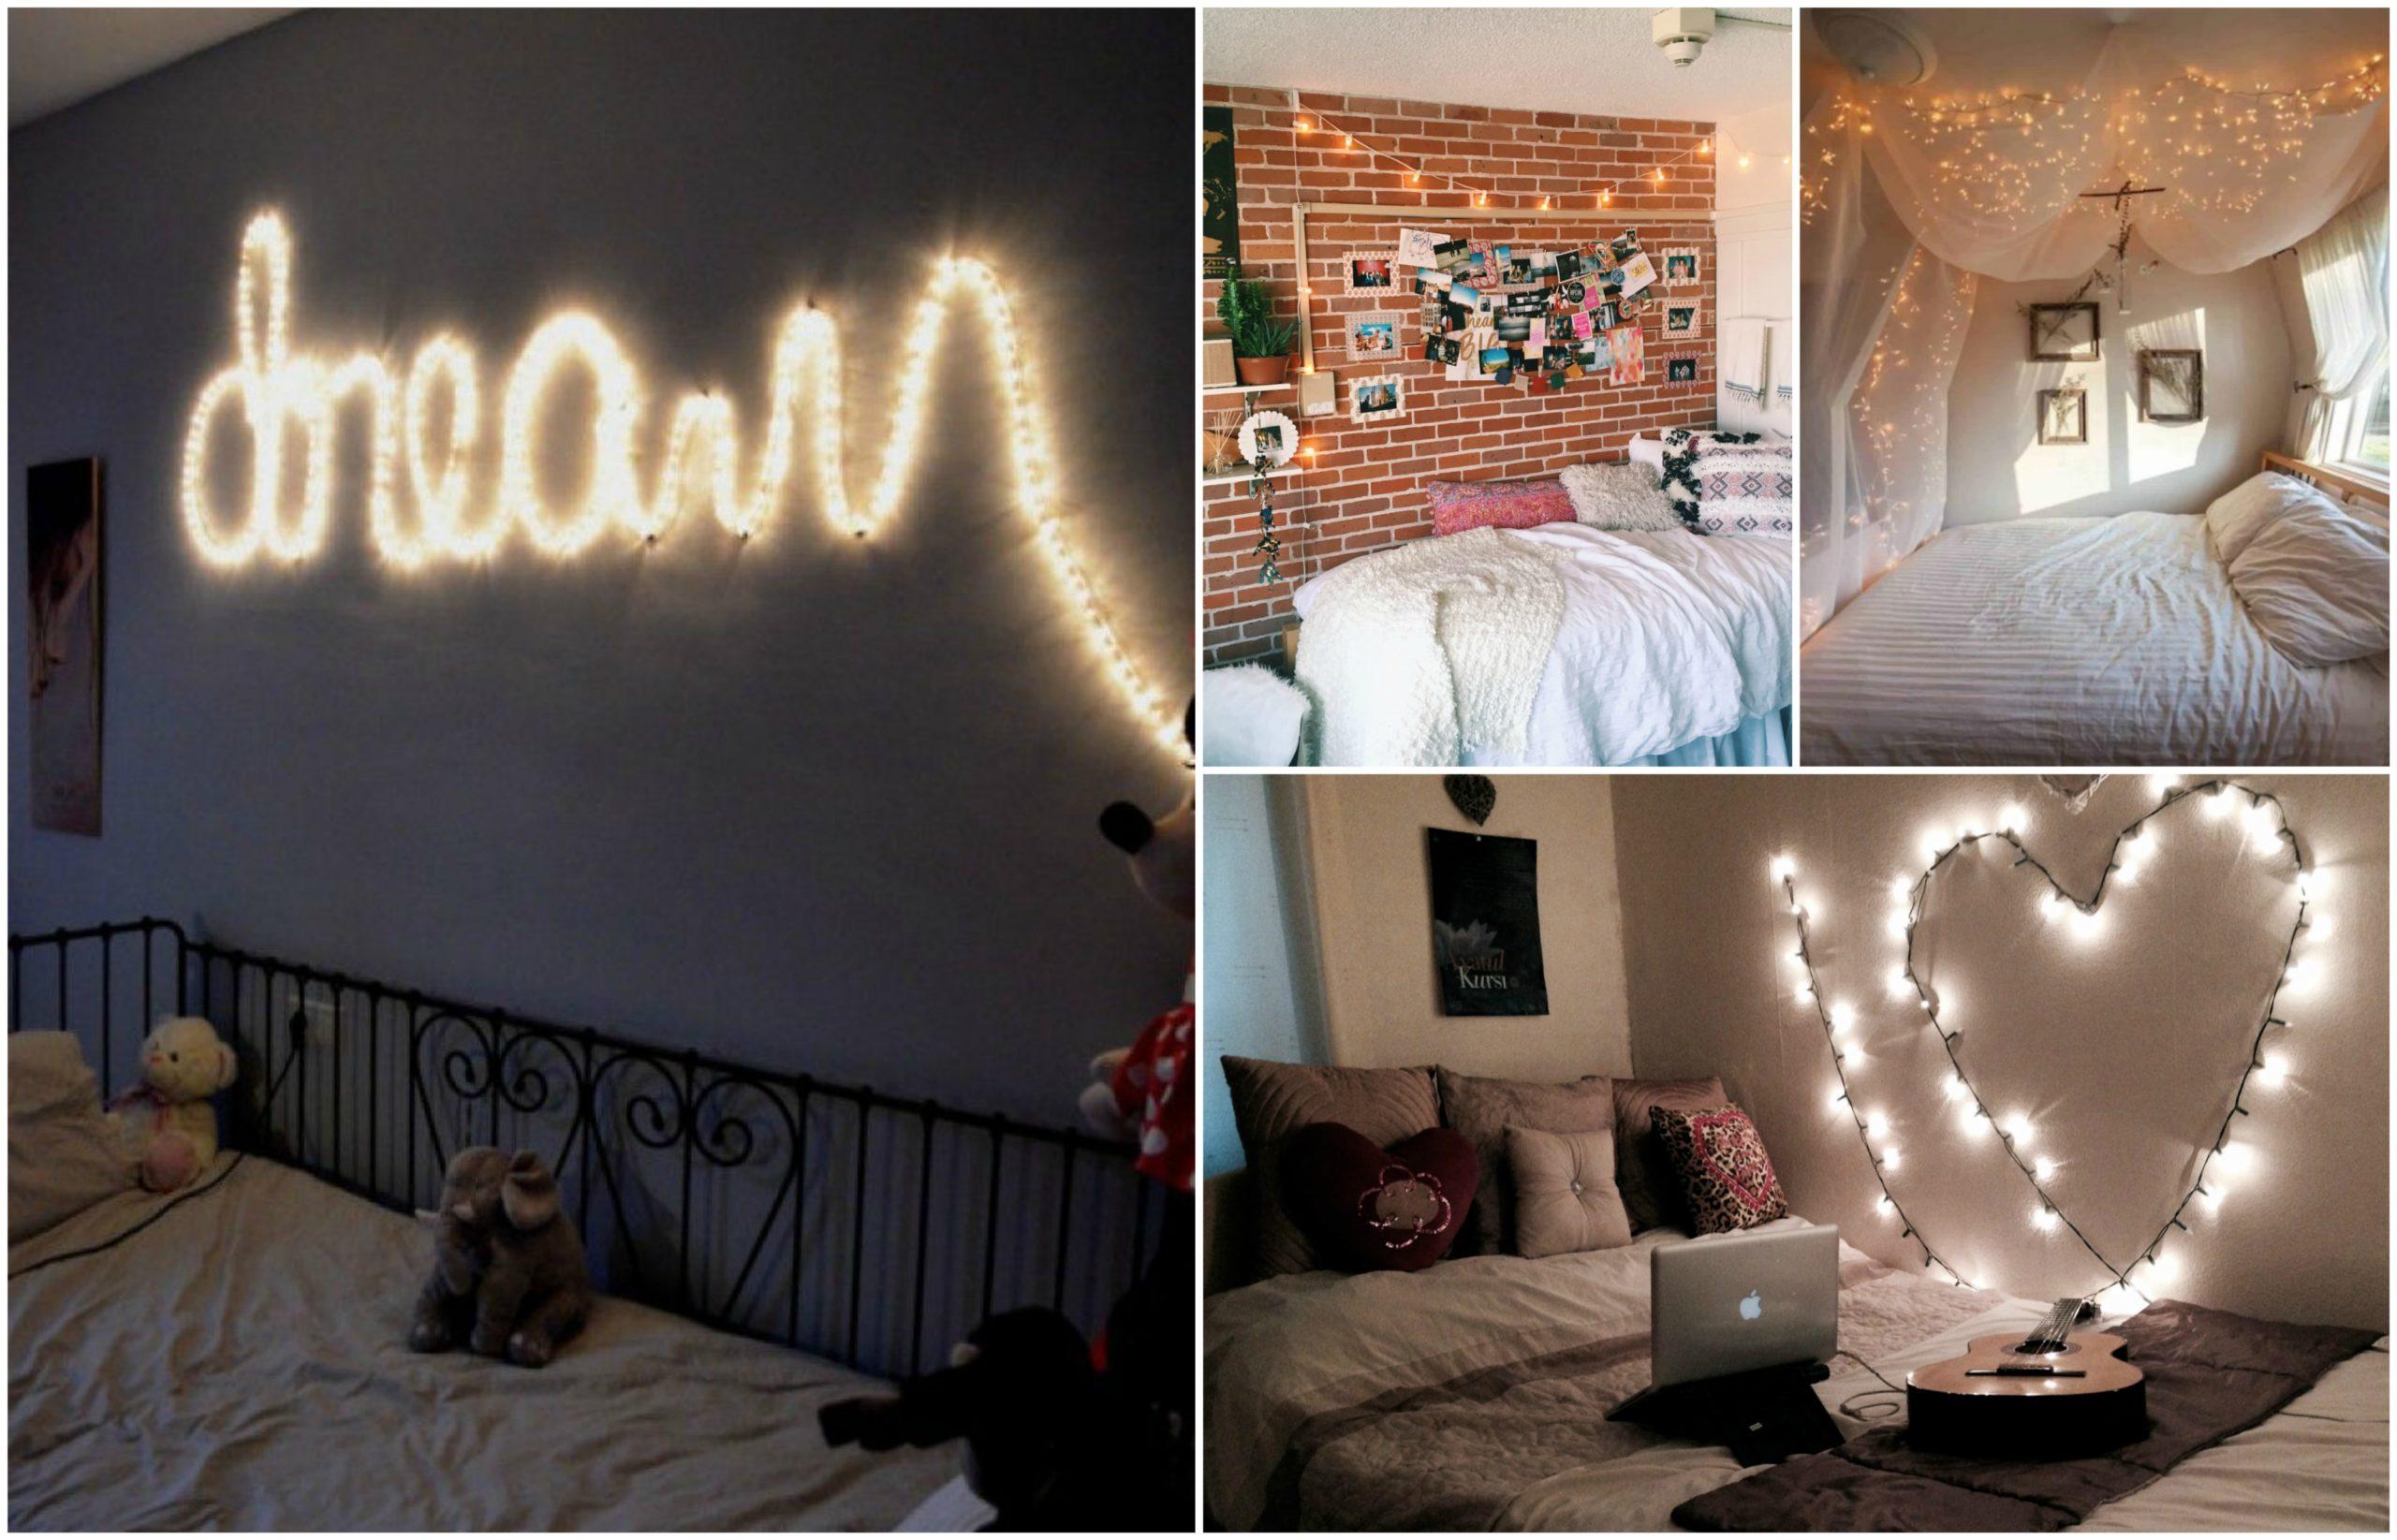 DIY String Lights Decorating Ideas For Your Bedroom ...